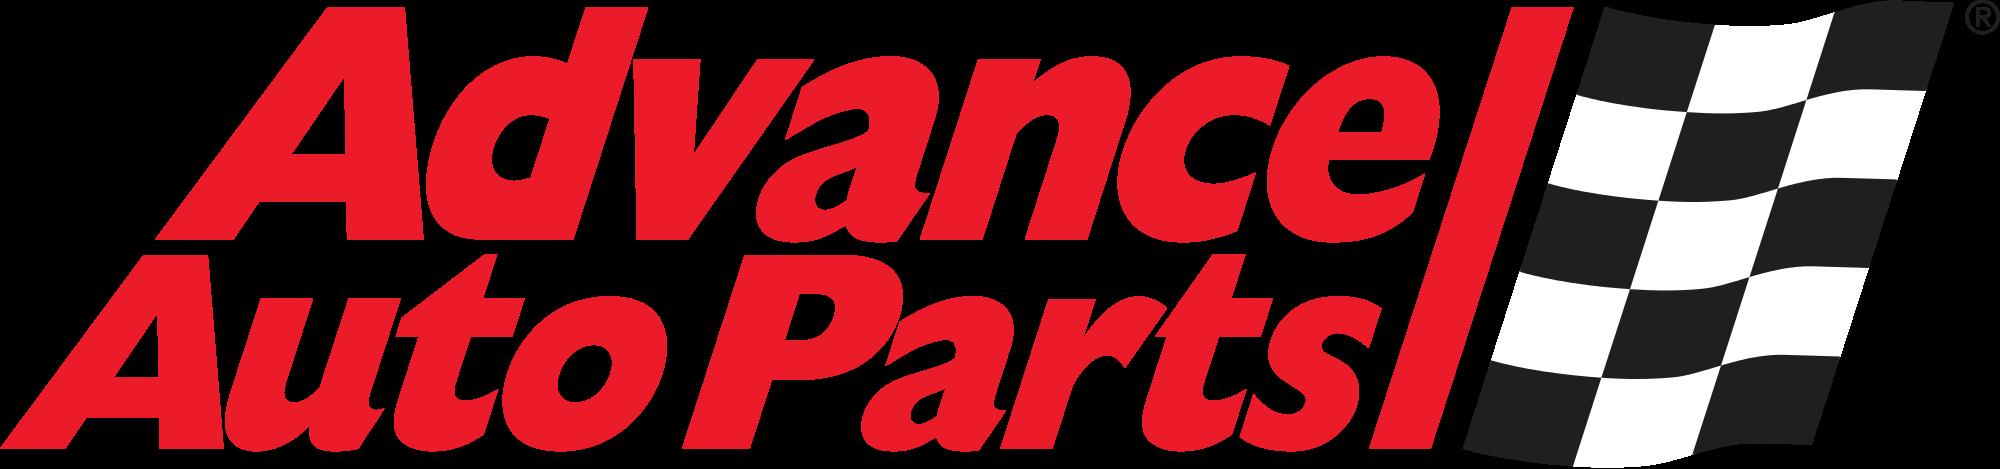 Advance Auto Parts Offers 10% Off